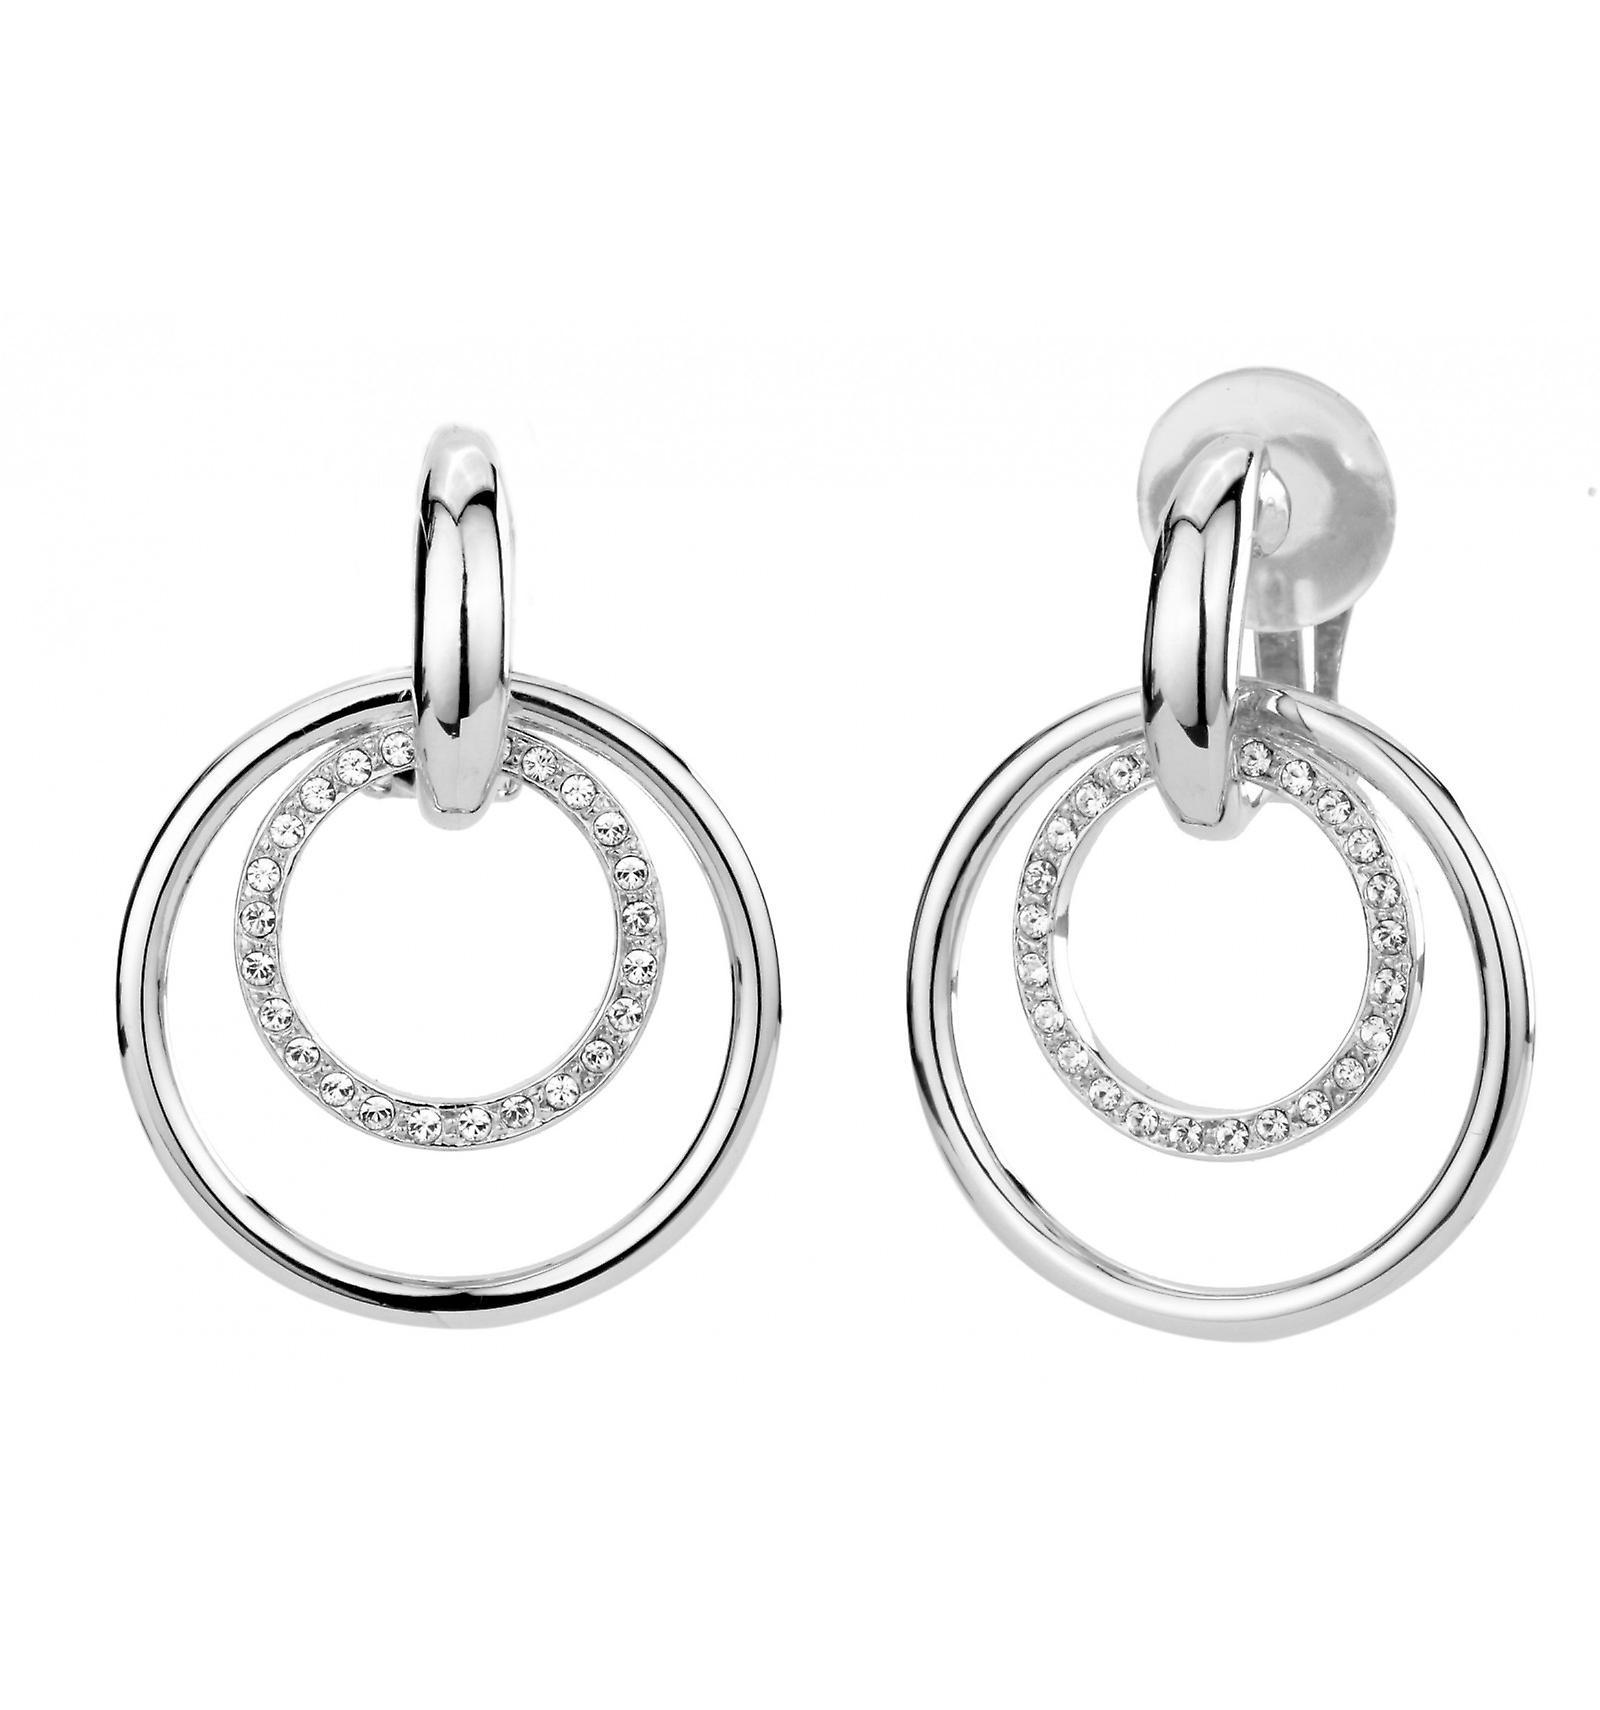 Traveller clip earring - Hanging - rhodium plated - Swarovski Crystals - 157106